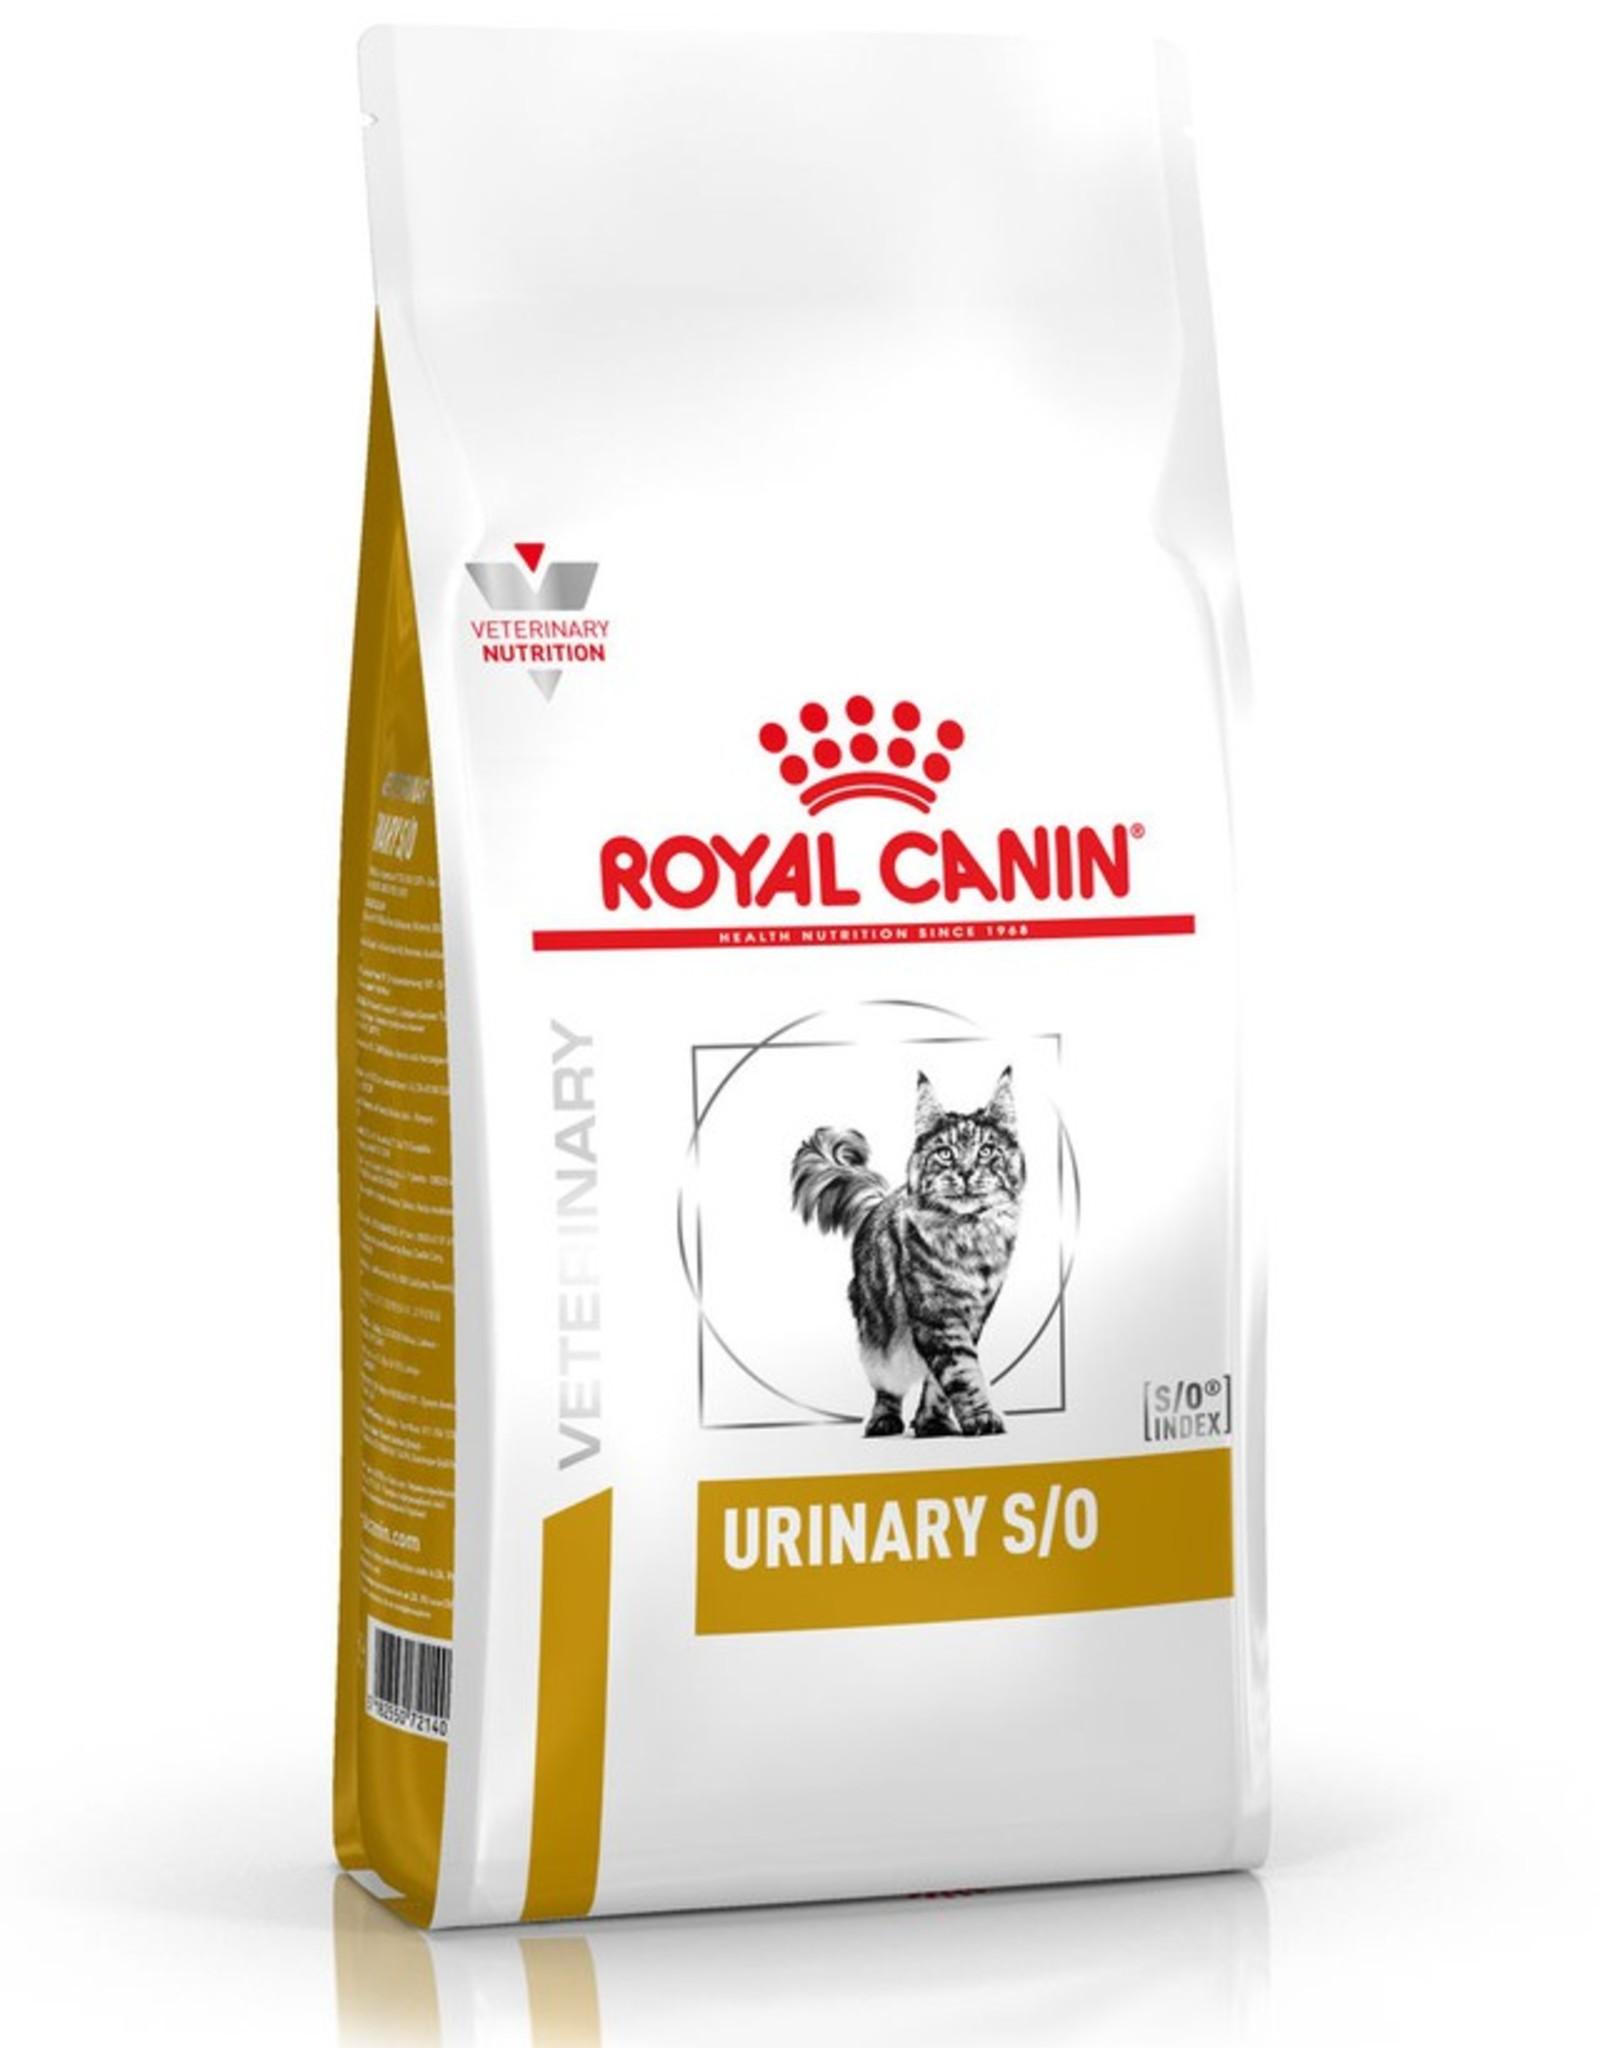 Royal Canin Royal Canin Urinary S/o Chat 3,5kg